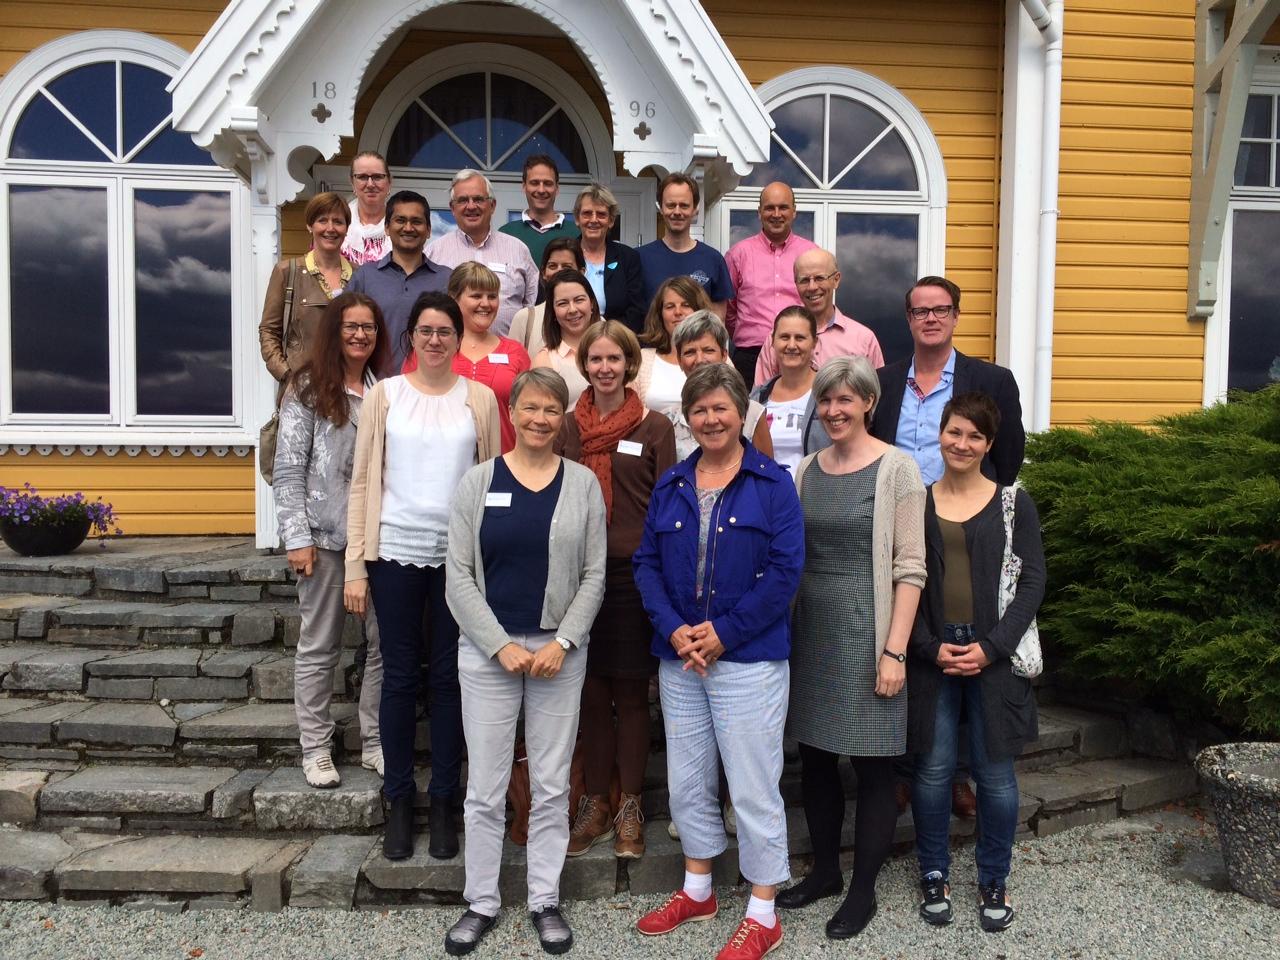 Participants in Solstrand, 2014 (photo: Siri Forsmo)